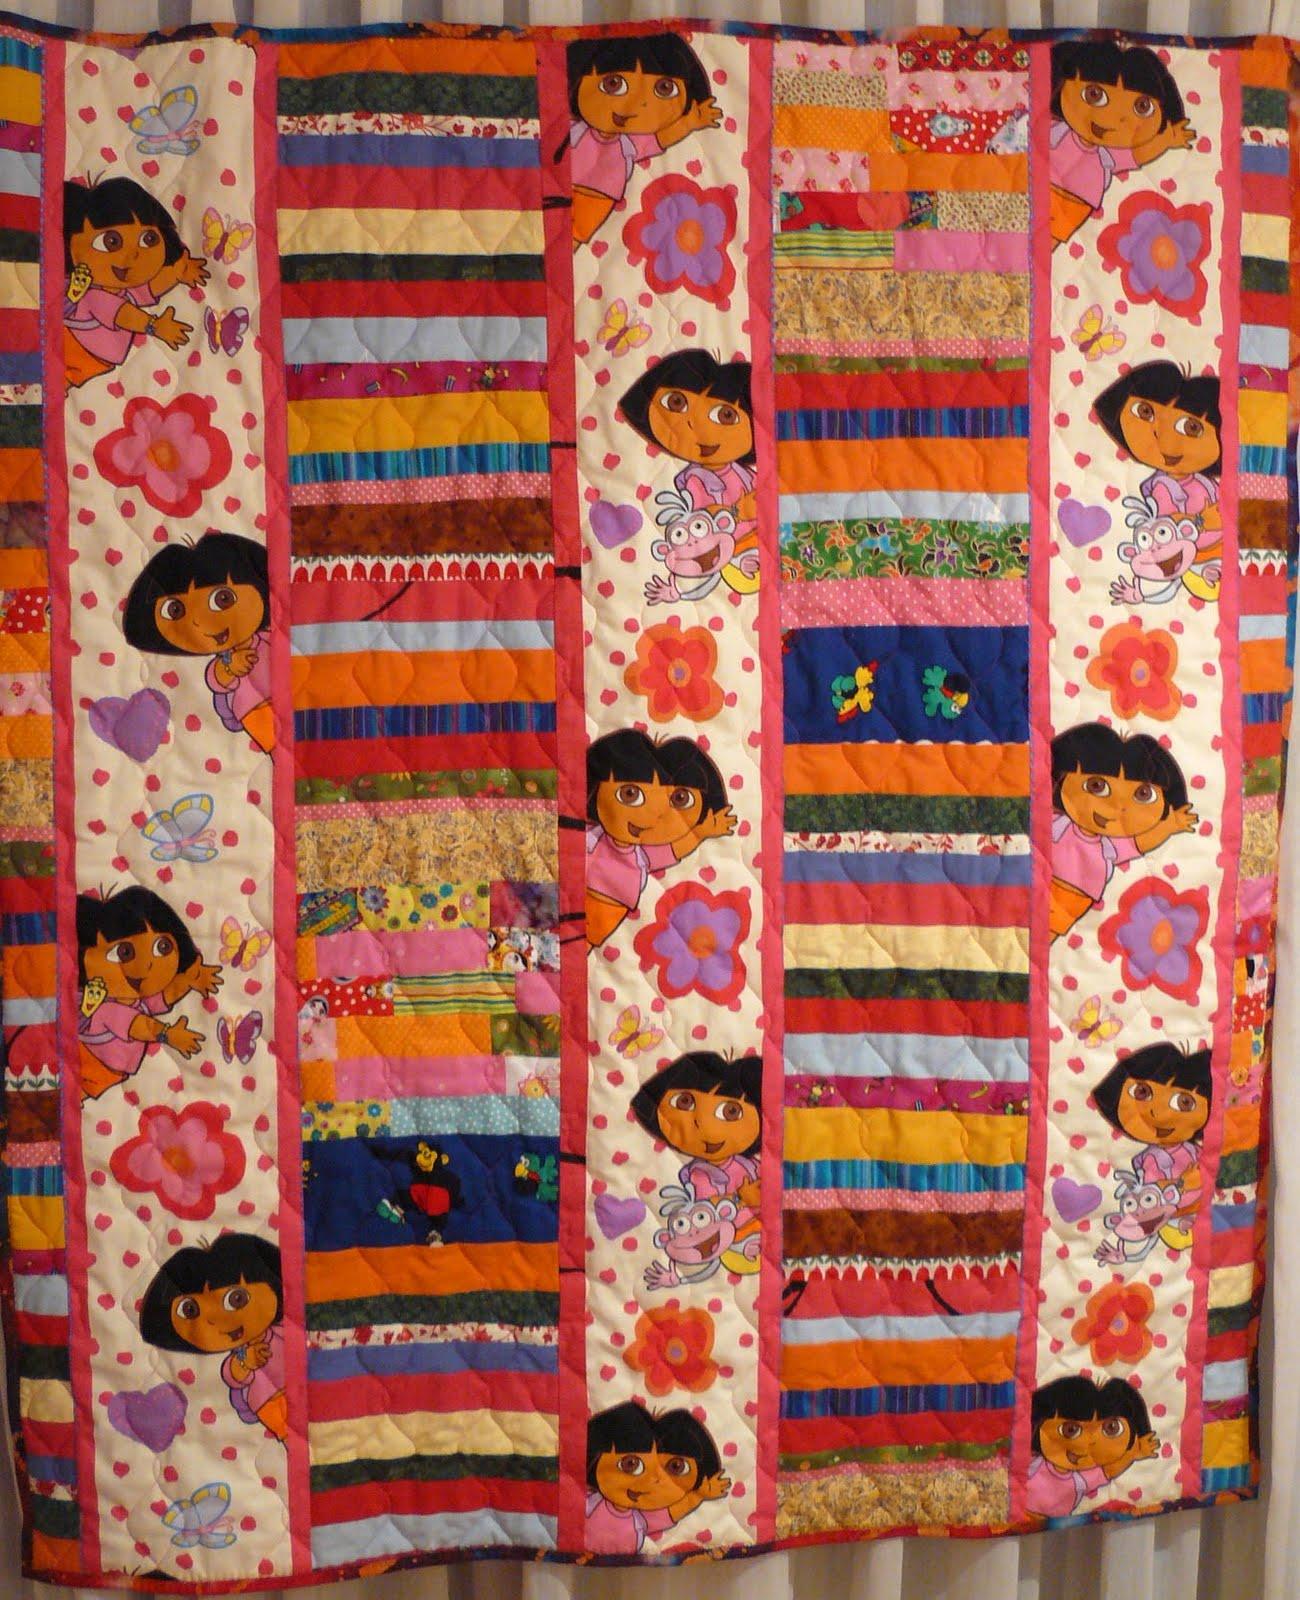 Quilt Tassen : Quilting trui wat hebben vrouwen toch met tassen